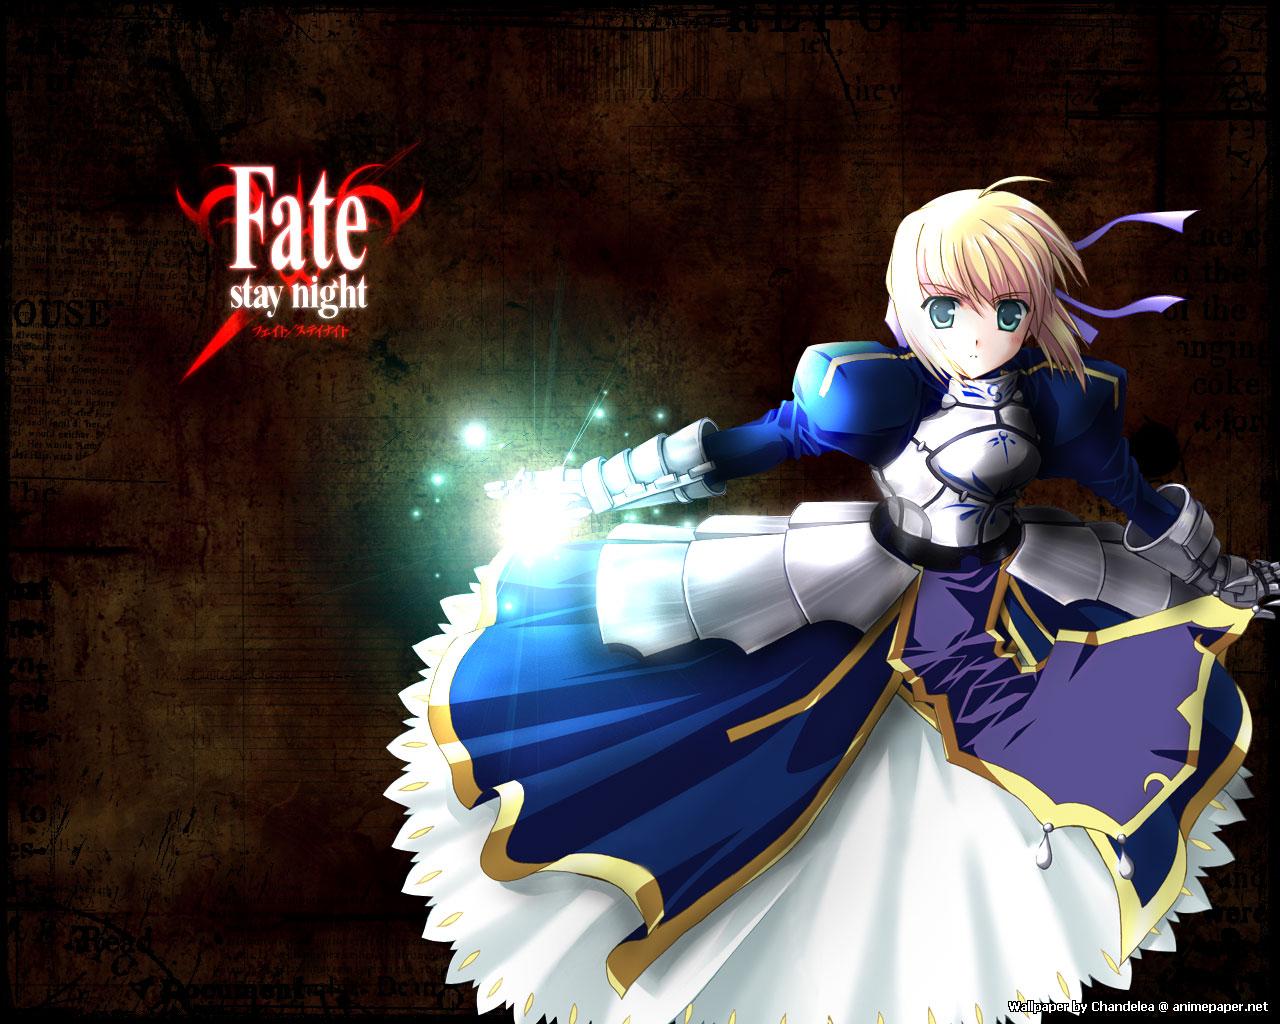 [AnimePaper]wallpapers_Fate-Stay-Night_Chandelea_17620